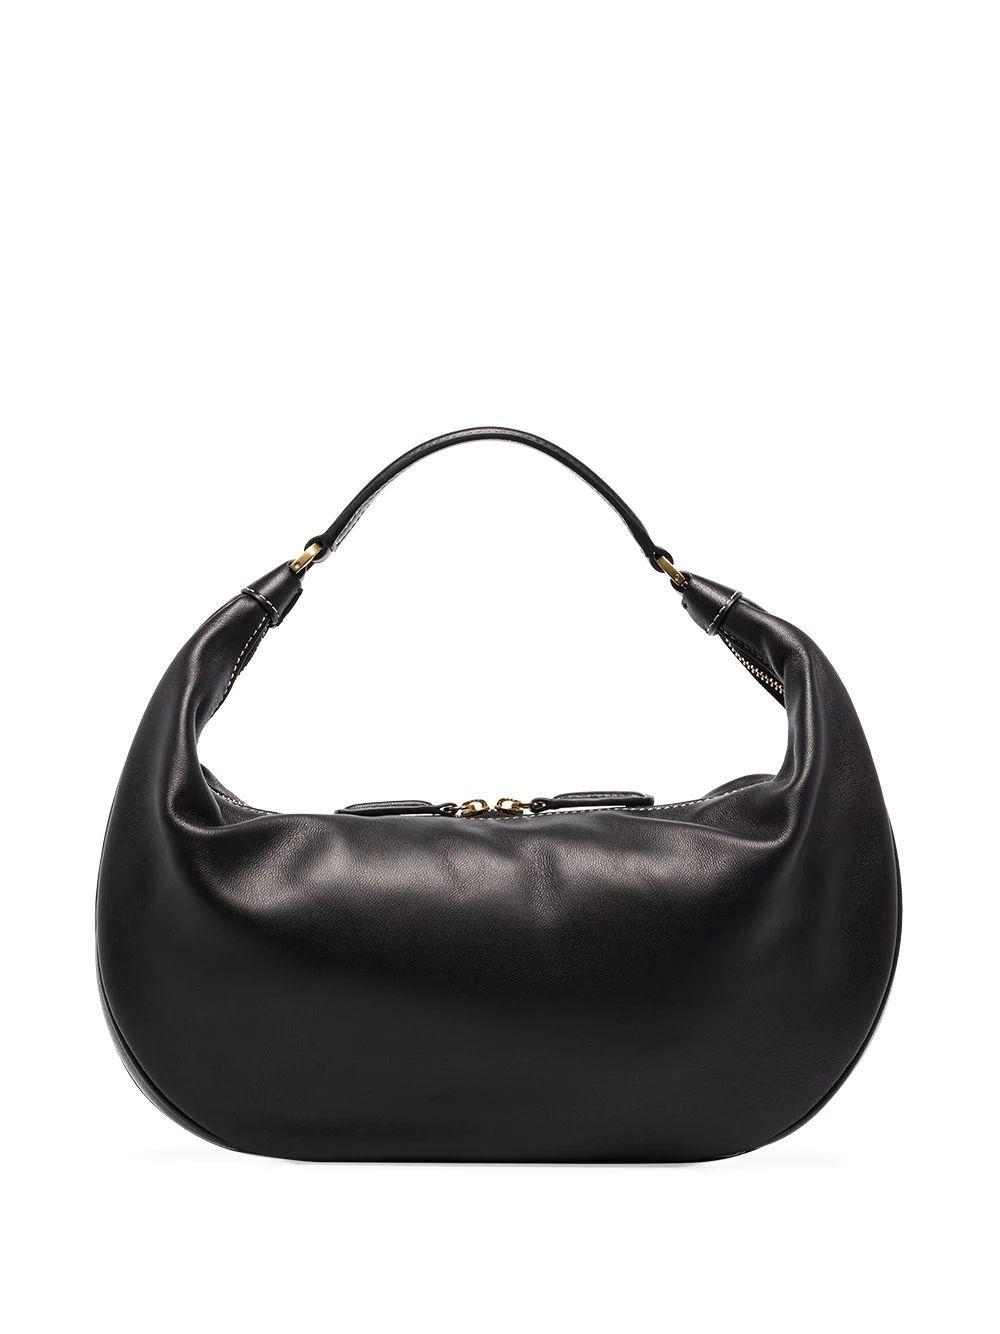 Sasha Bag Item # 207-9161-BLK